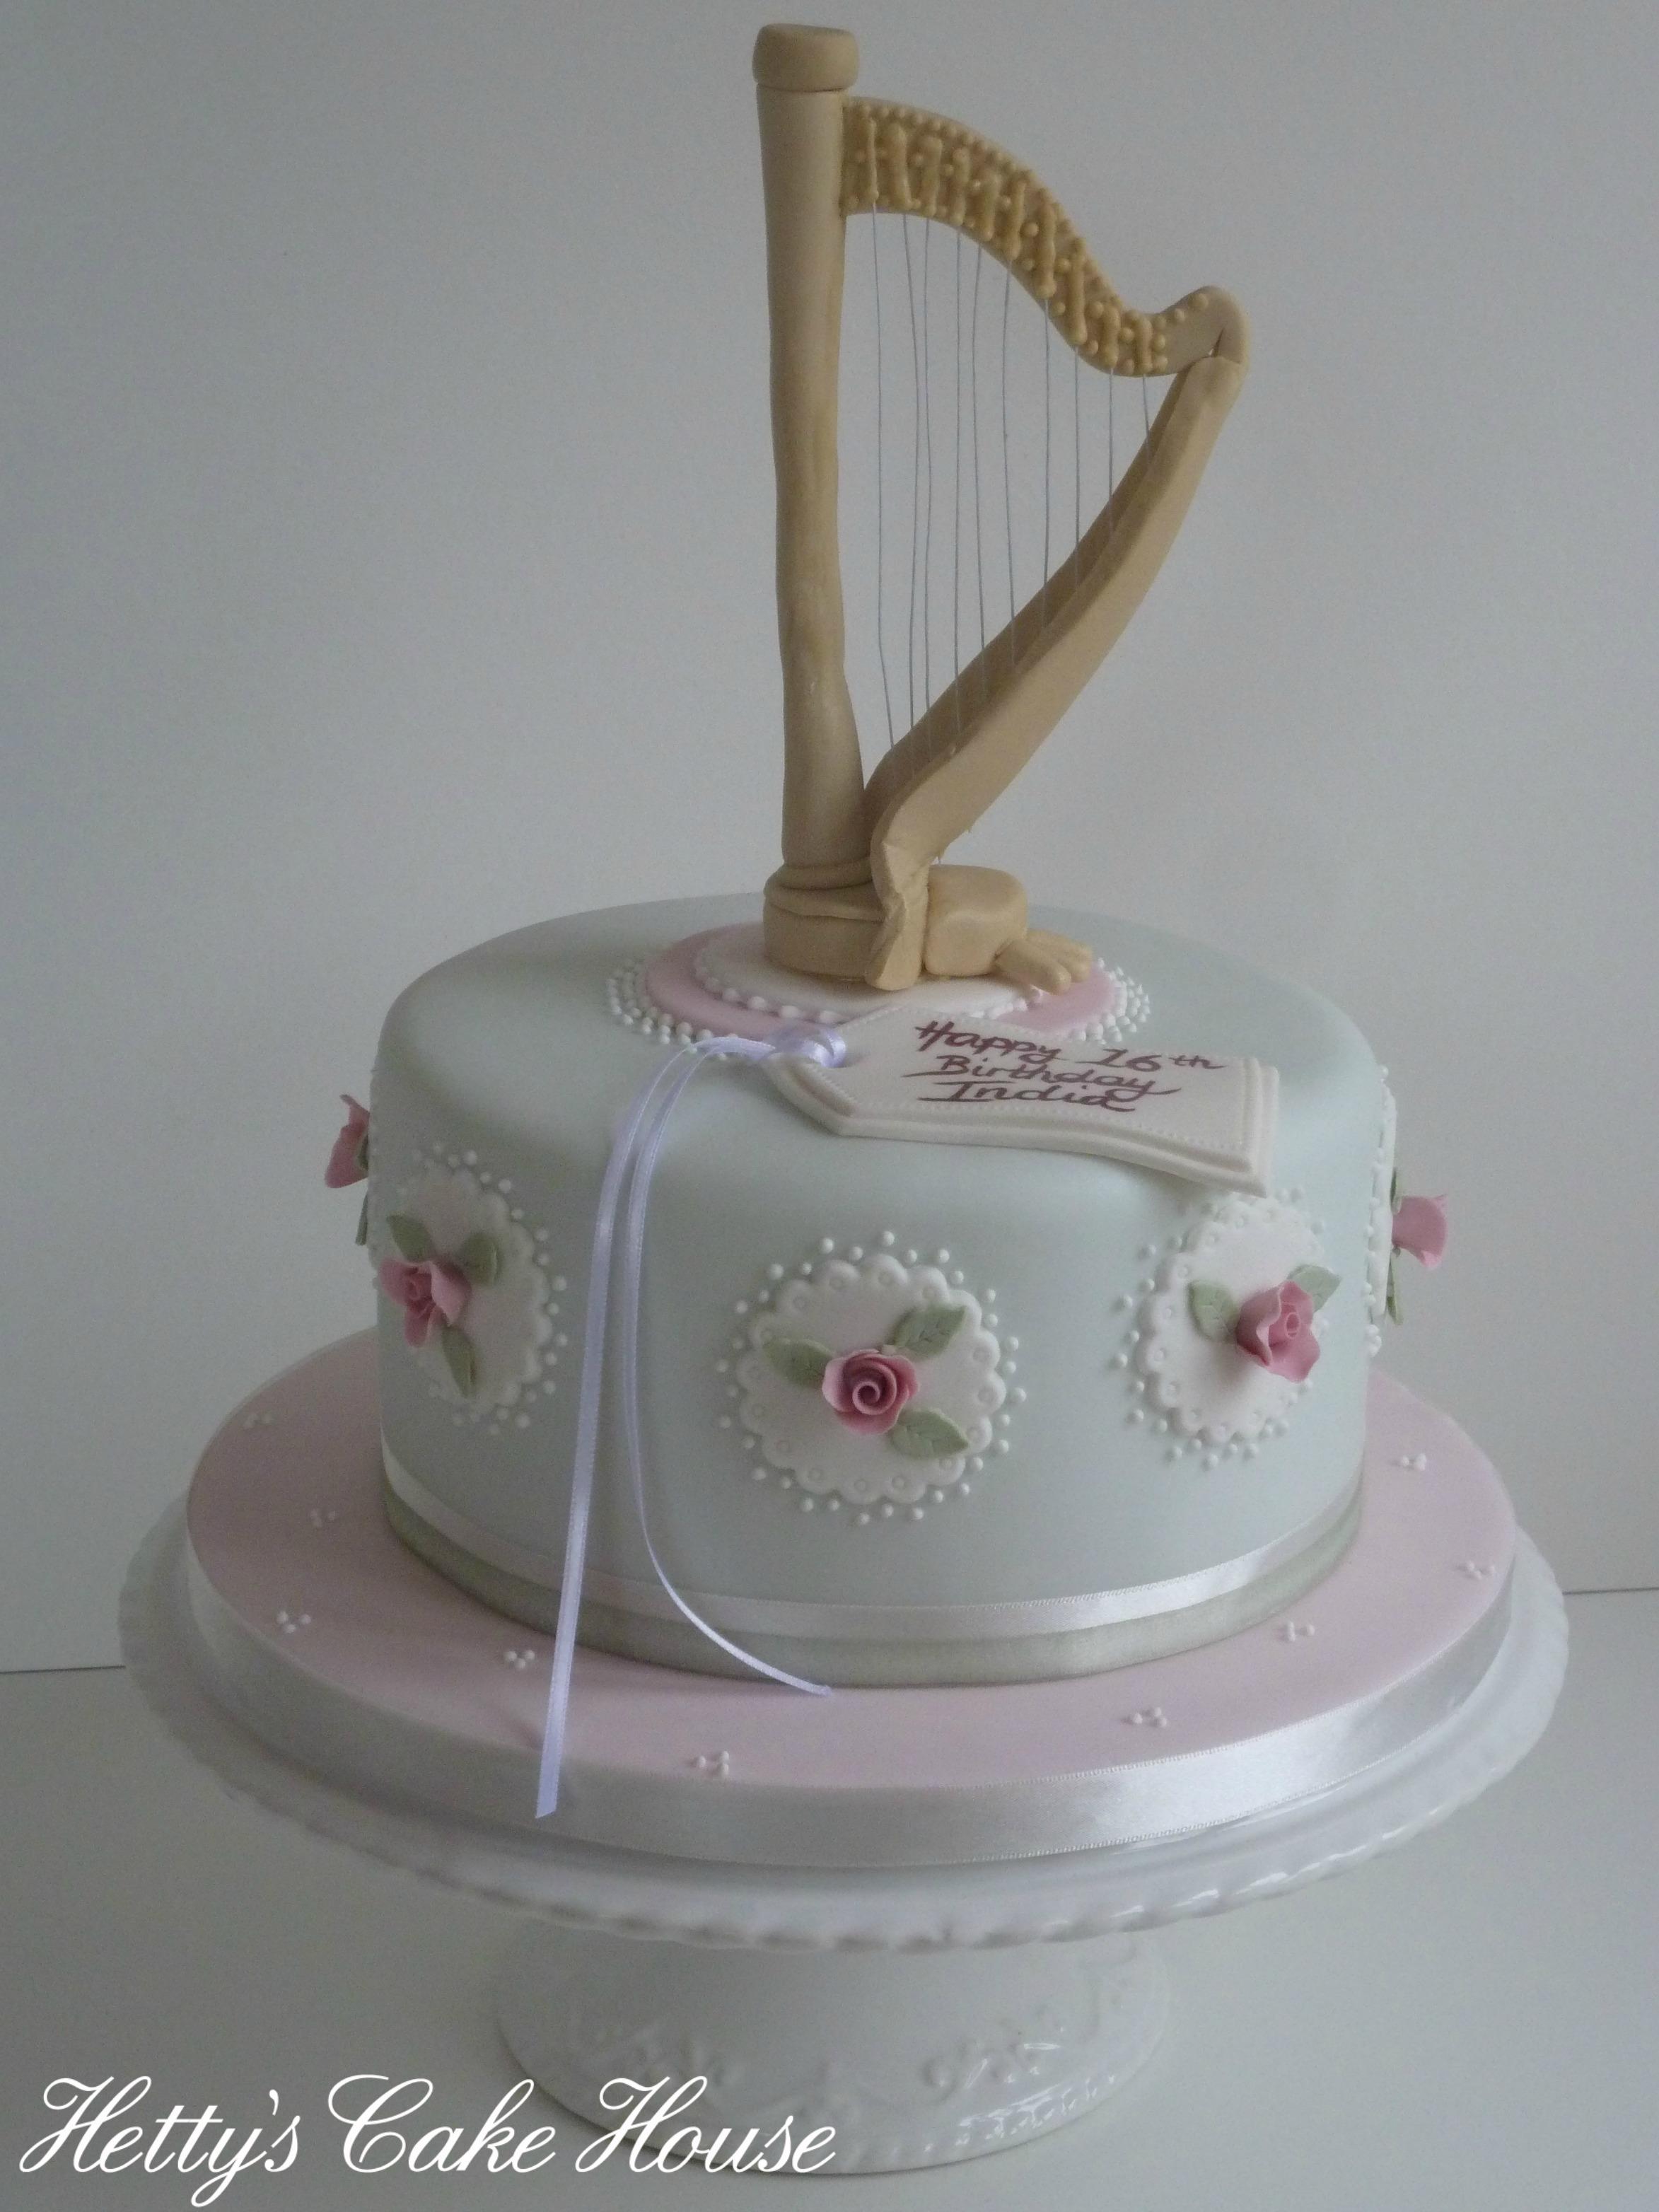 Celebration Cakes Hettys Cake House